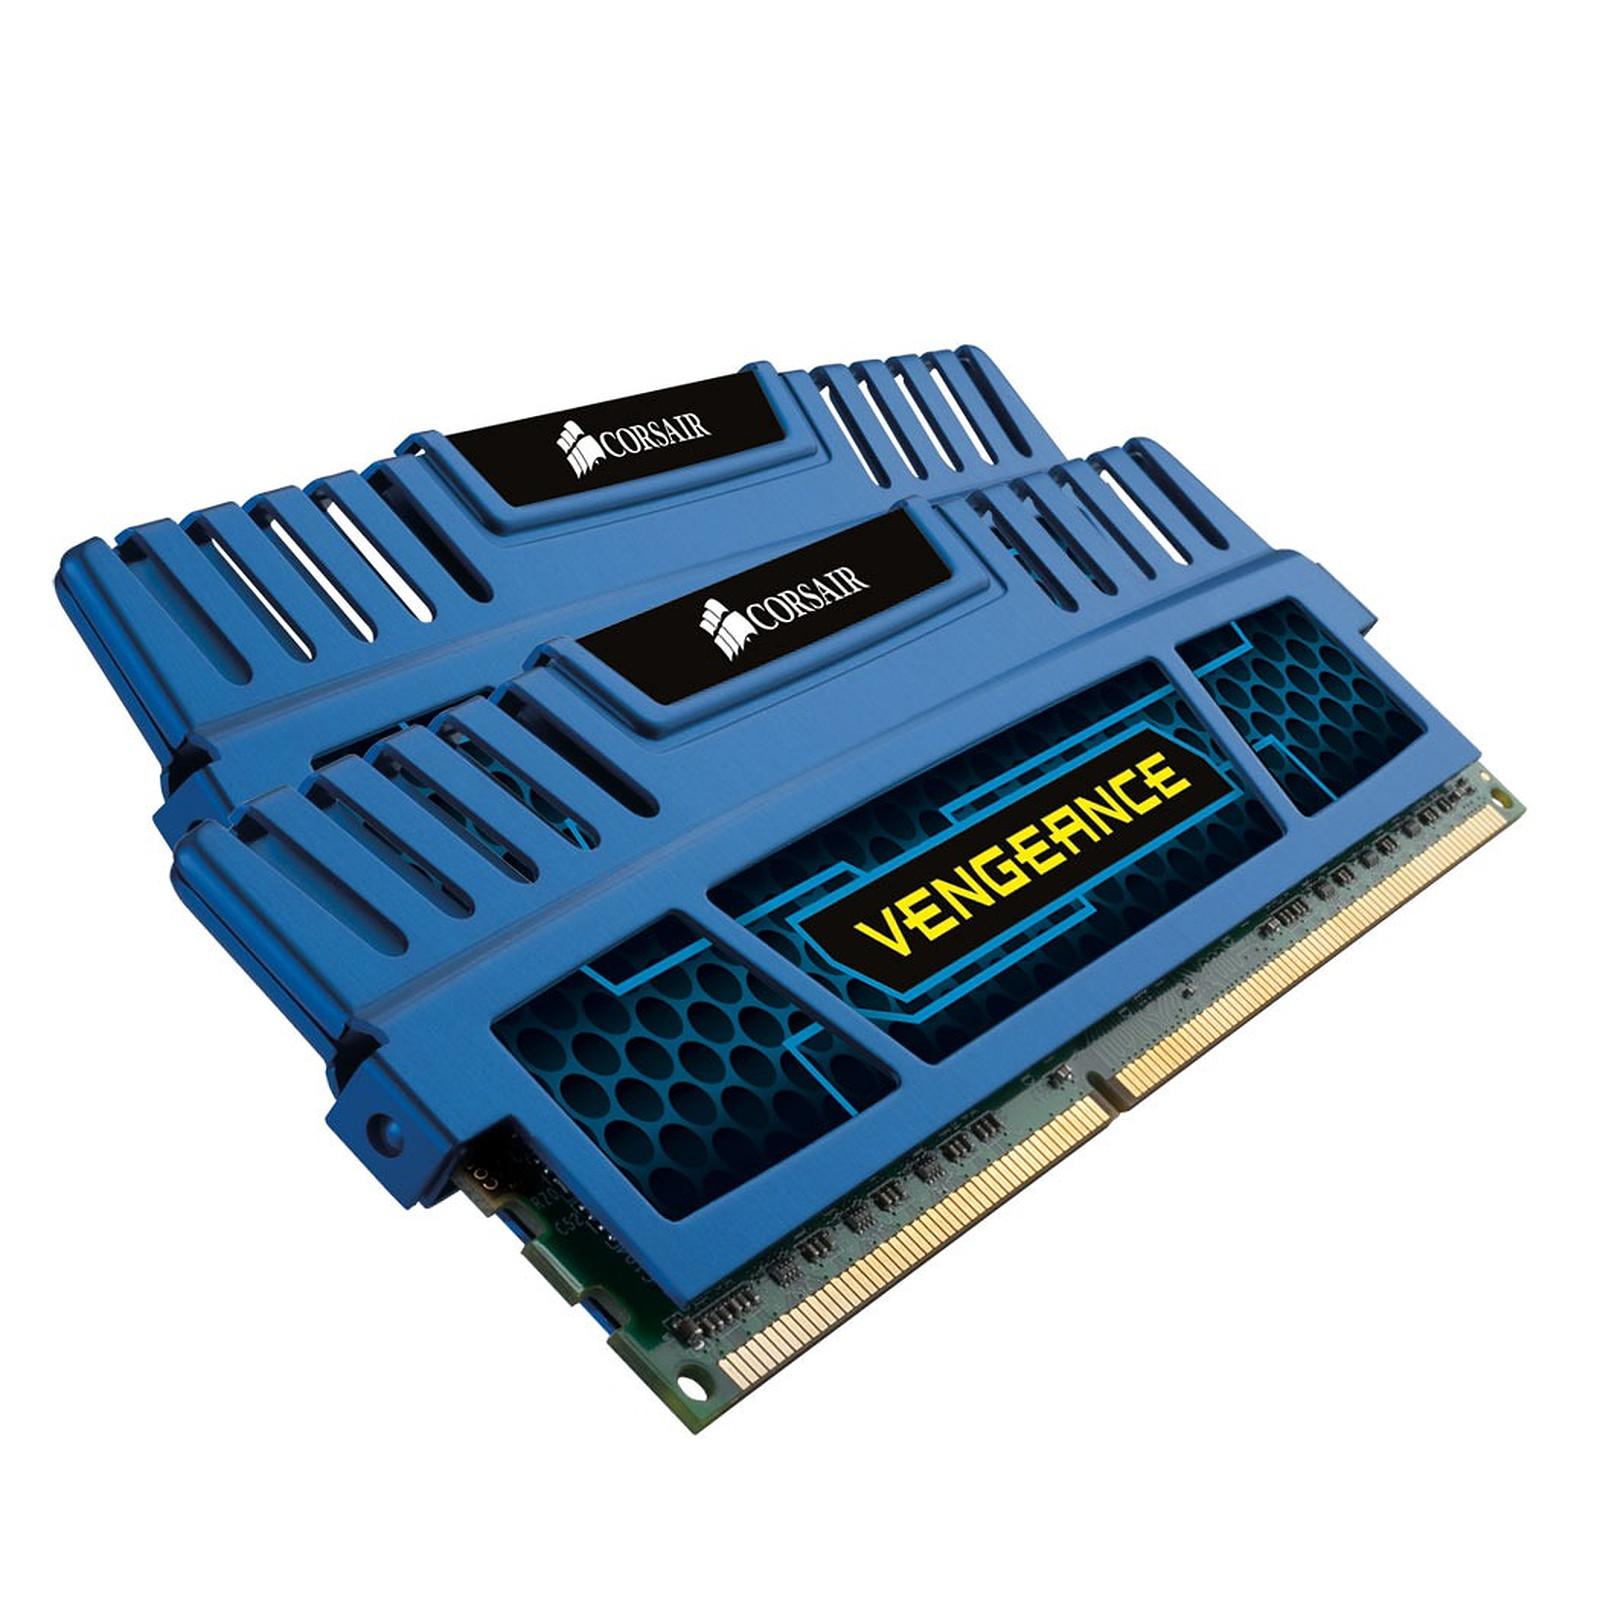 Corsair Vengeance Series 8 Go (2x 4 Go) DDR3 1600 MHz CL9 Bleu